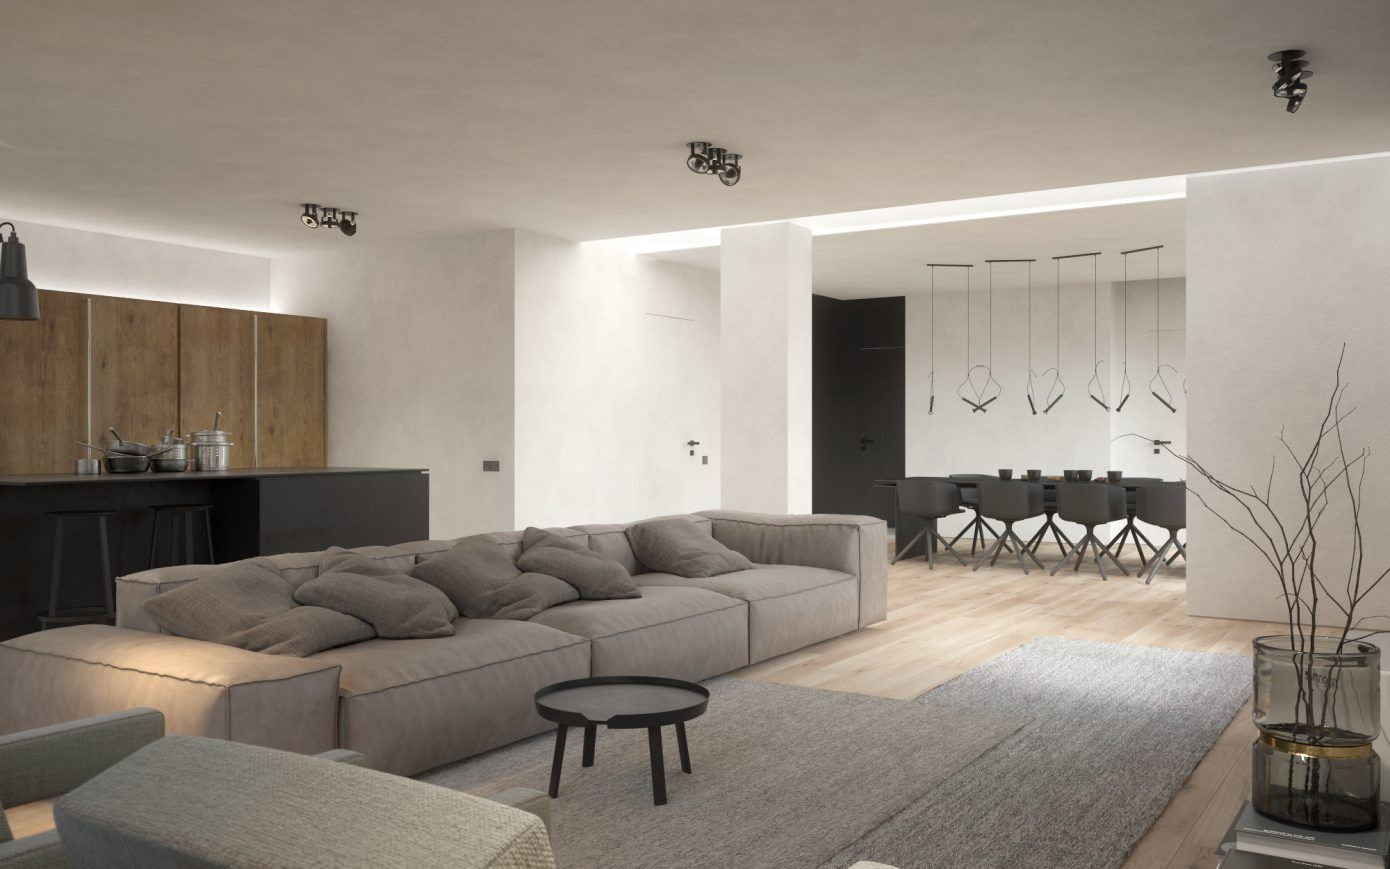 Three room apartment by kdva architects homeadore minimalist apartment interior design living room